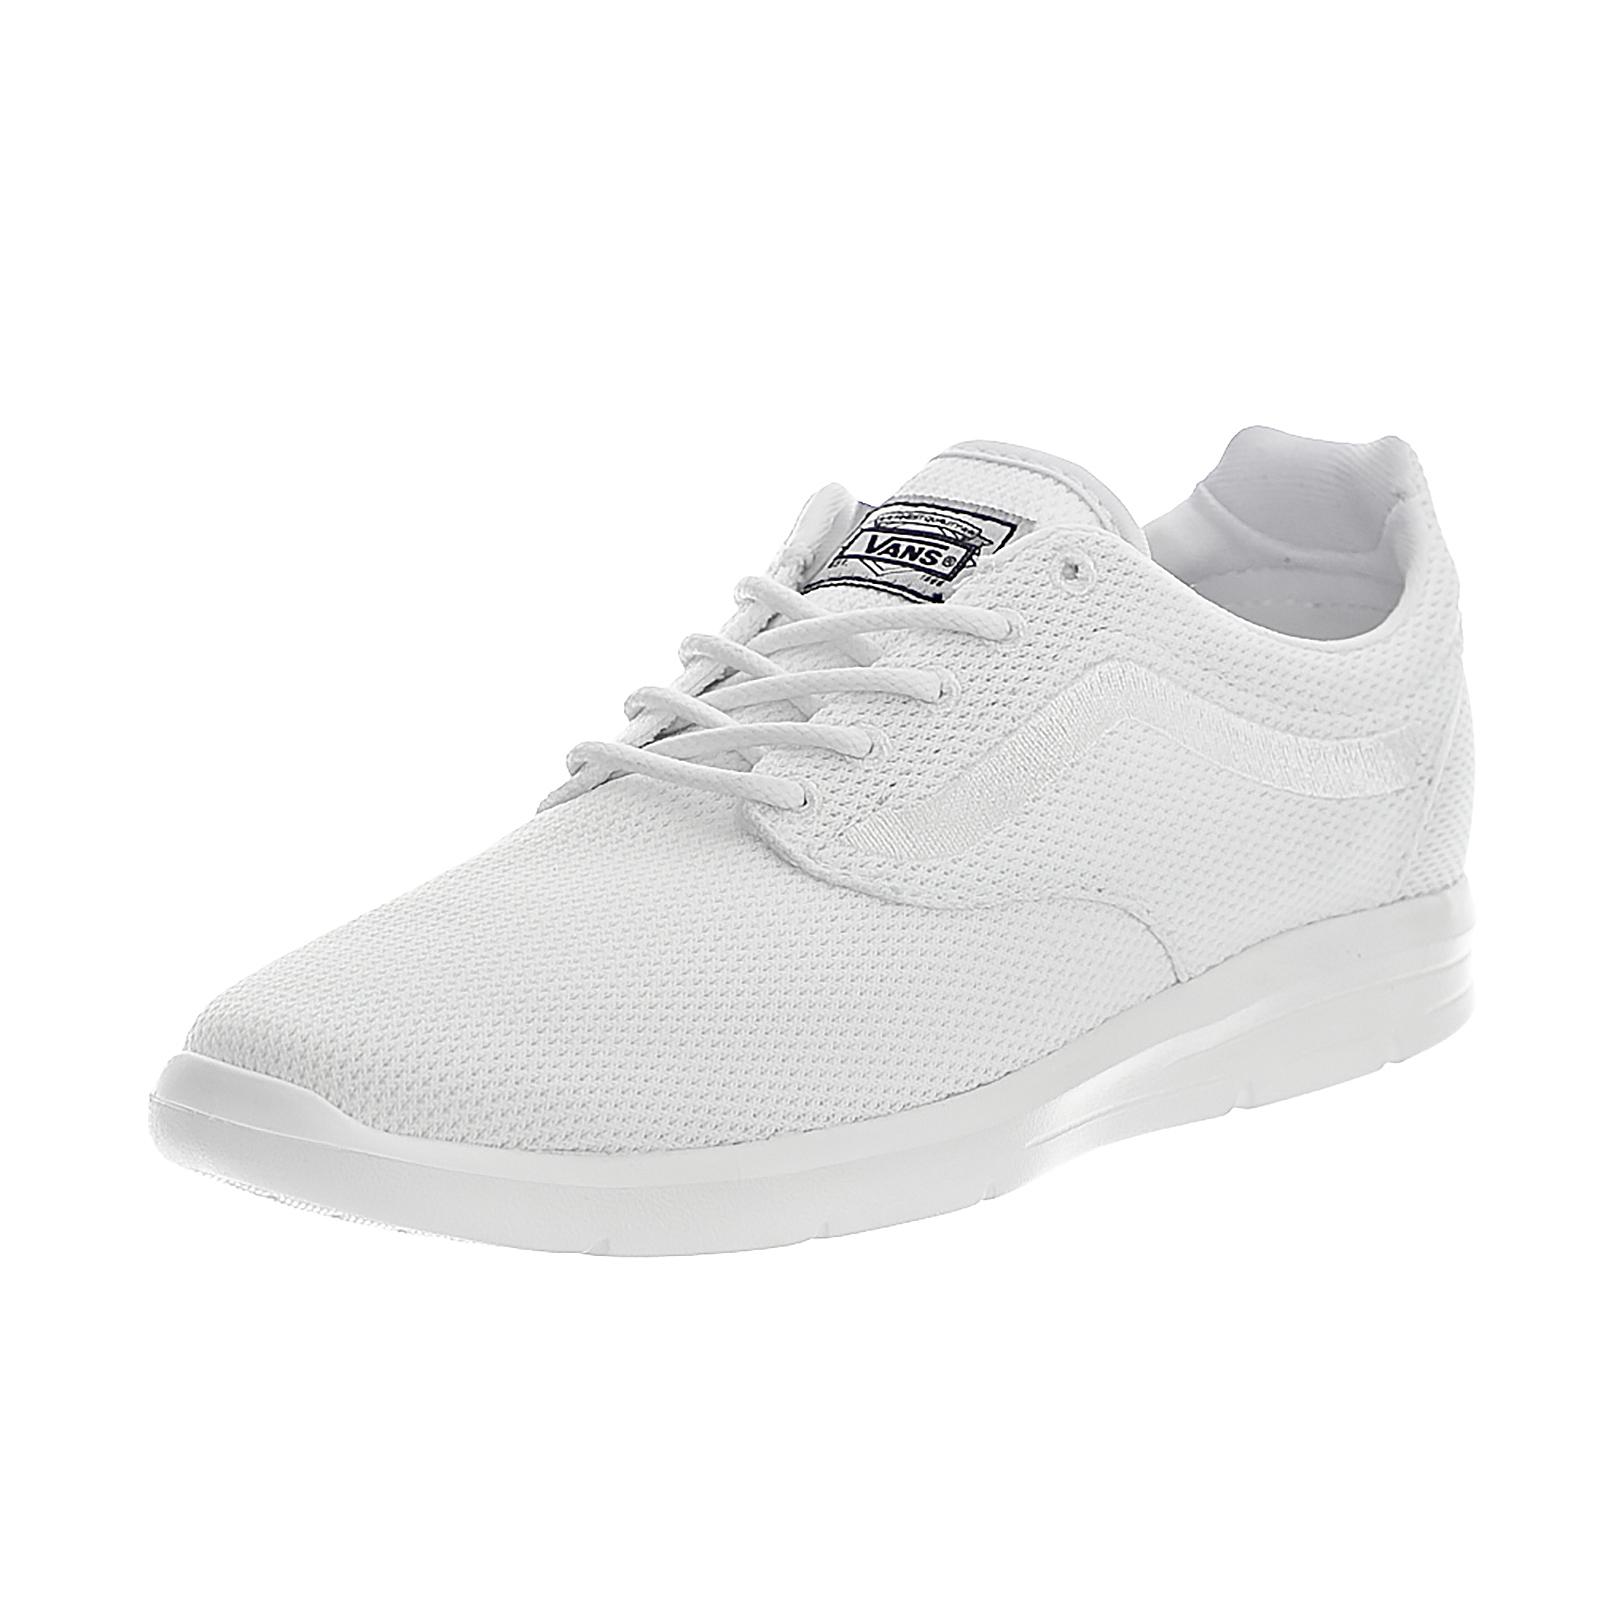 91ab263c7fa65c Vans Sneakers Ua Iso 1.5 (Mesh) True White White